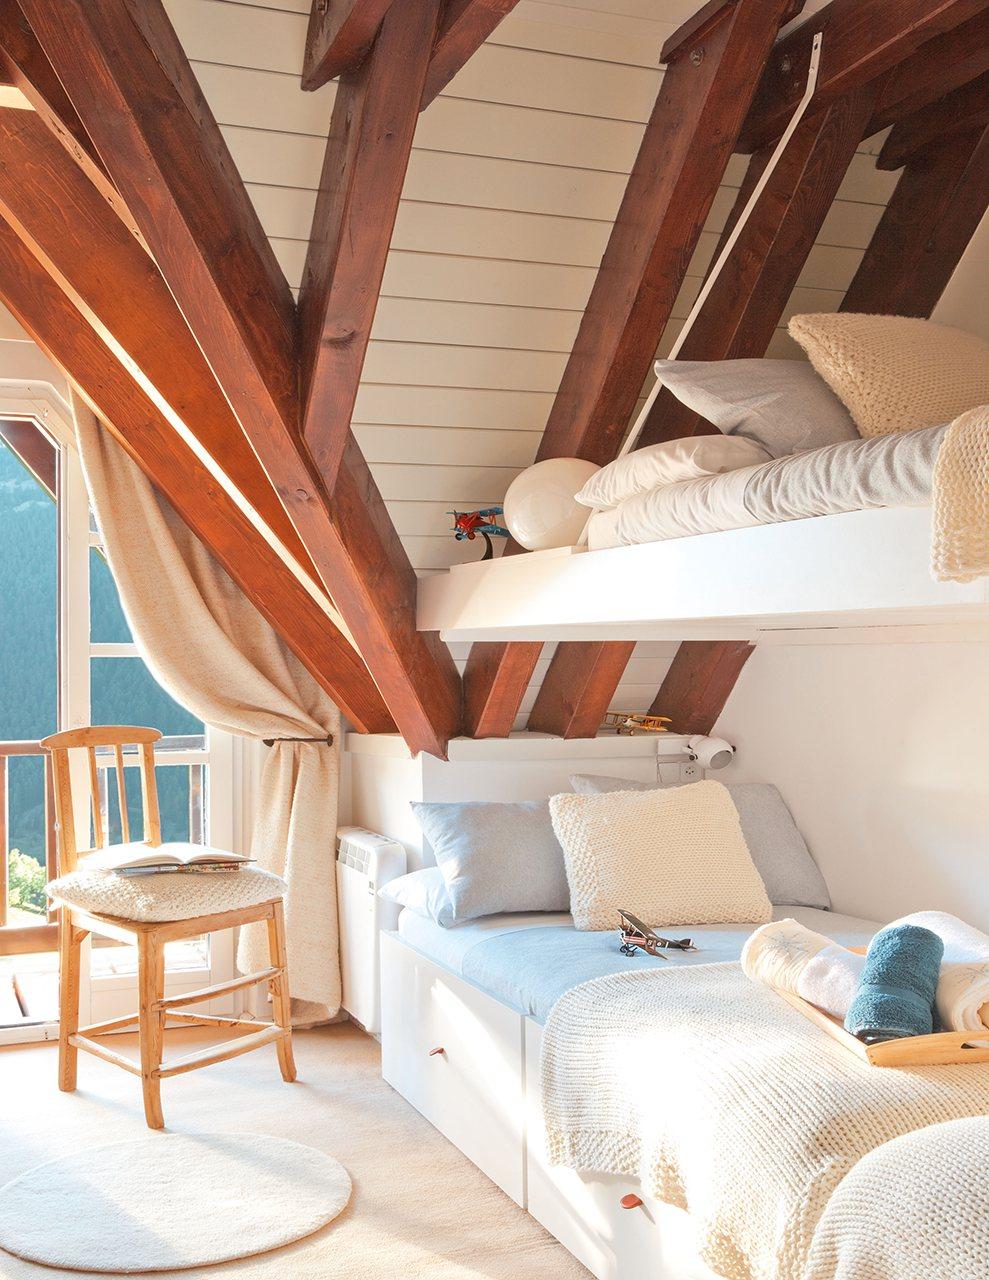 Ideas para aprovechar al m ximo el espacio de un piso peque o for Como aprovechar espacios pequenos habitacion